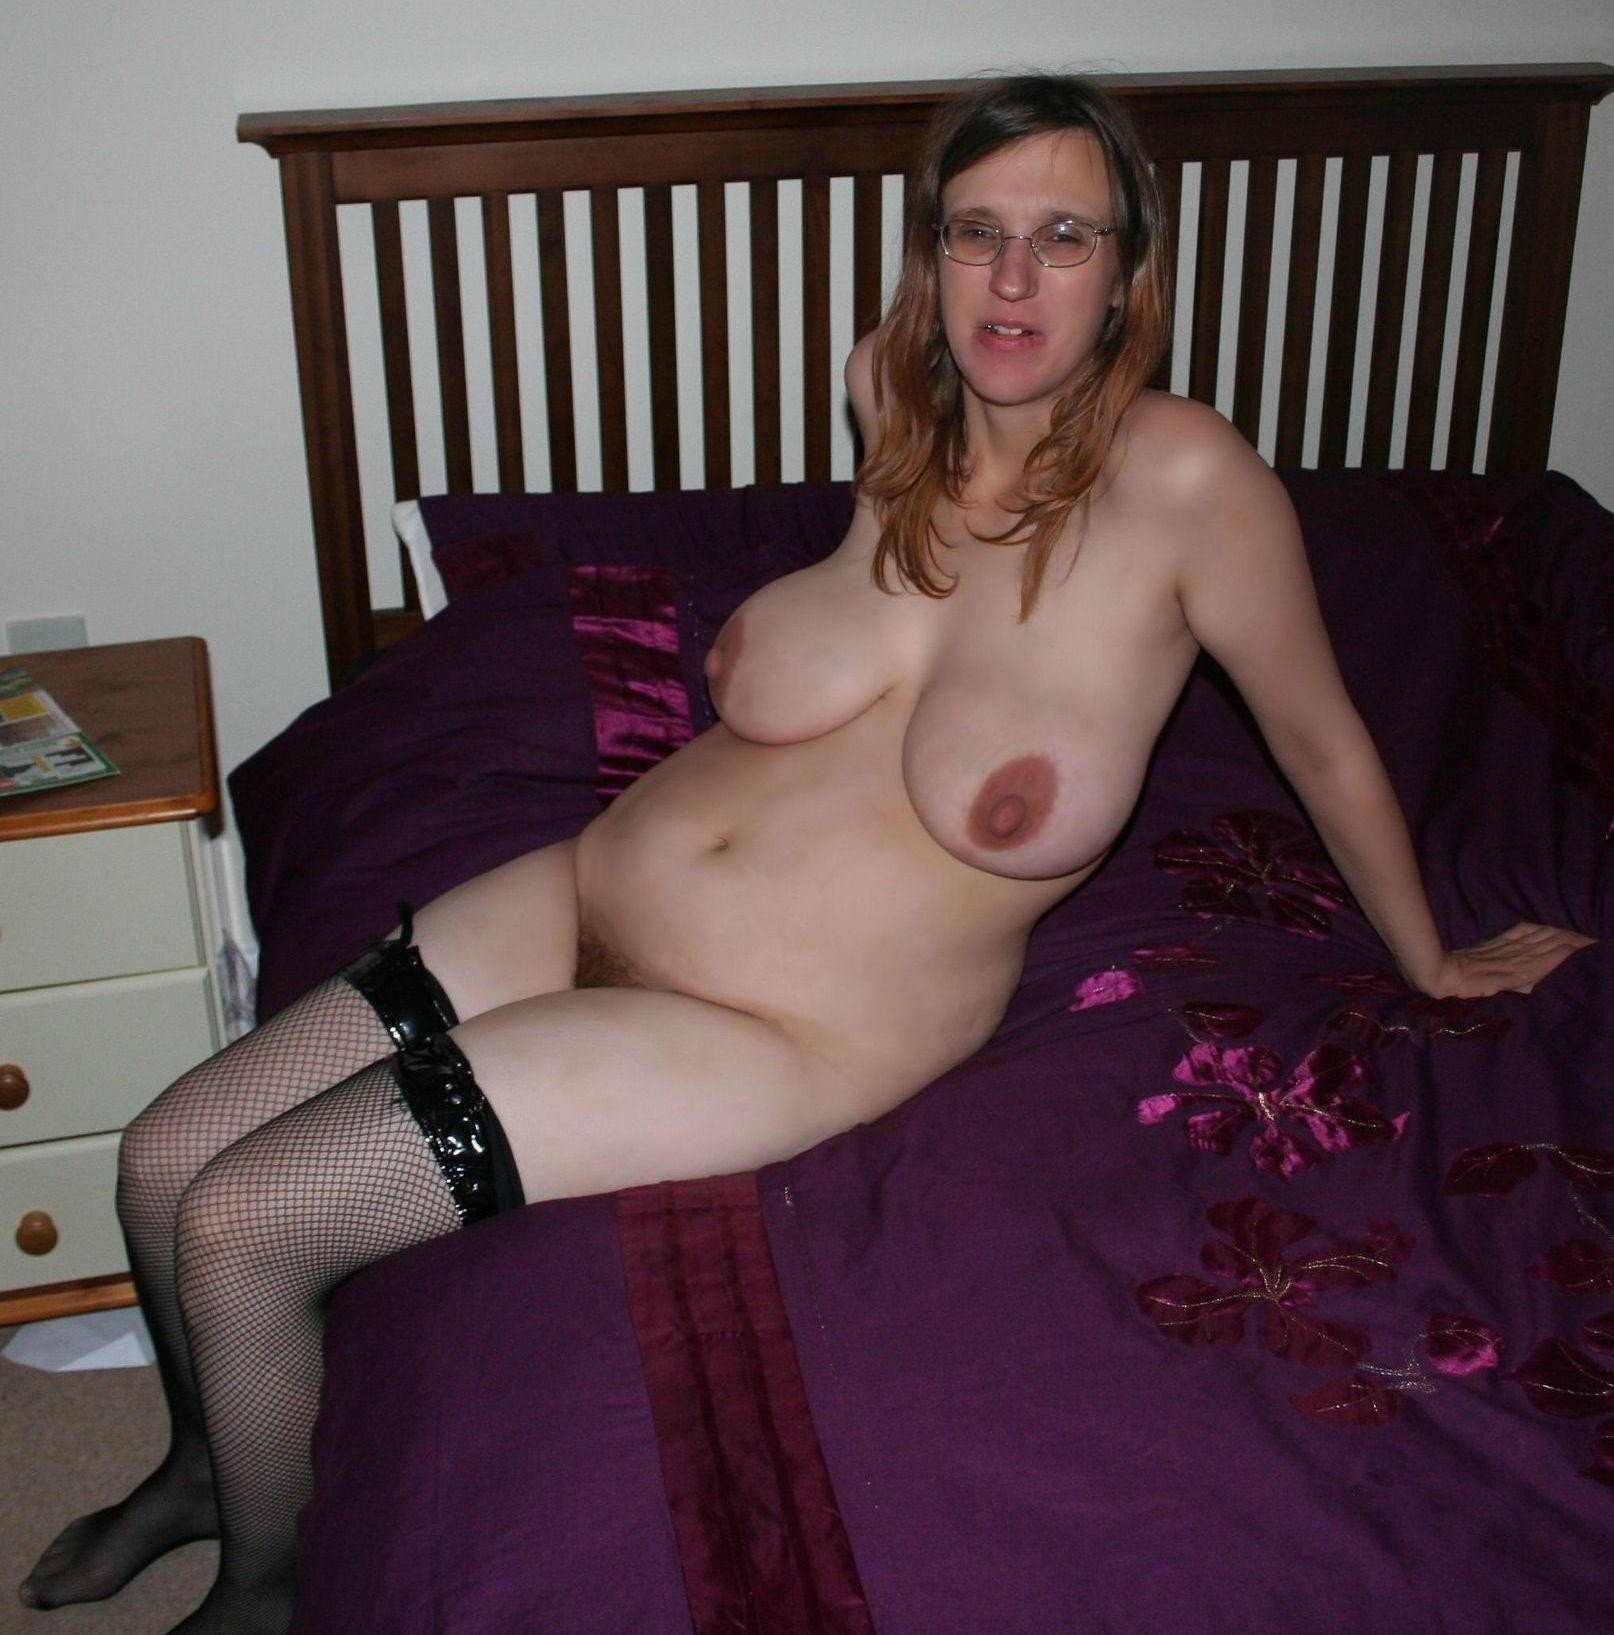 Gifs marure naked ass bent over